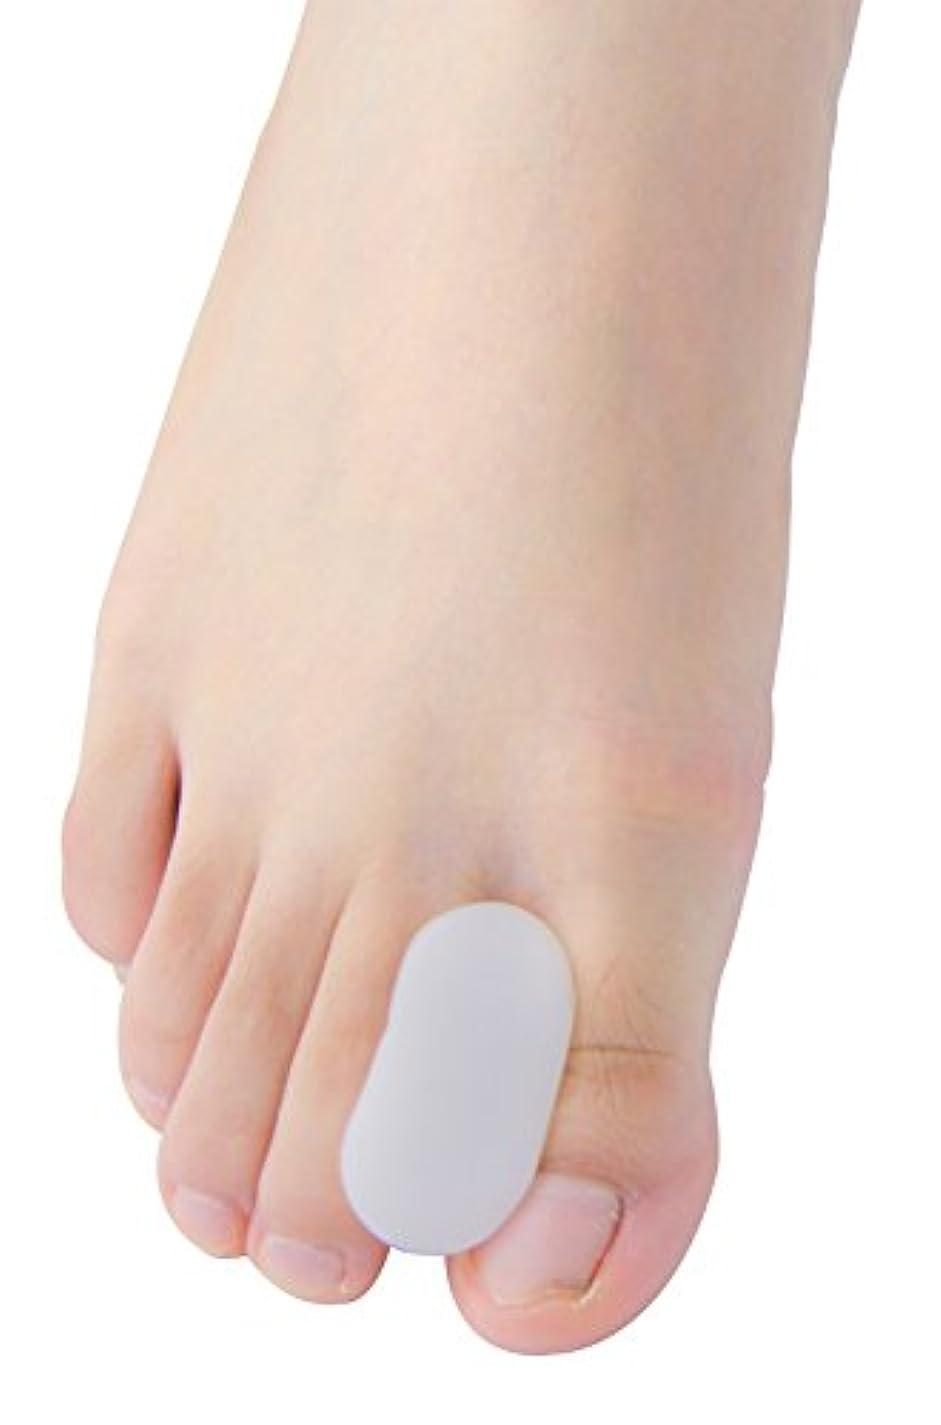 Povihome 足指衝撃ストッパー, 足指セパレーター,外反母趾 サポーター 矯正 バニオン 5ペア,柔らかゲルでやさしくサポート(M)